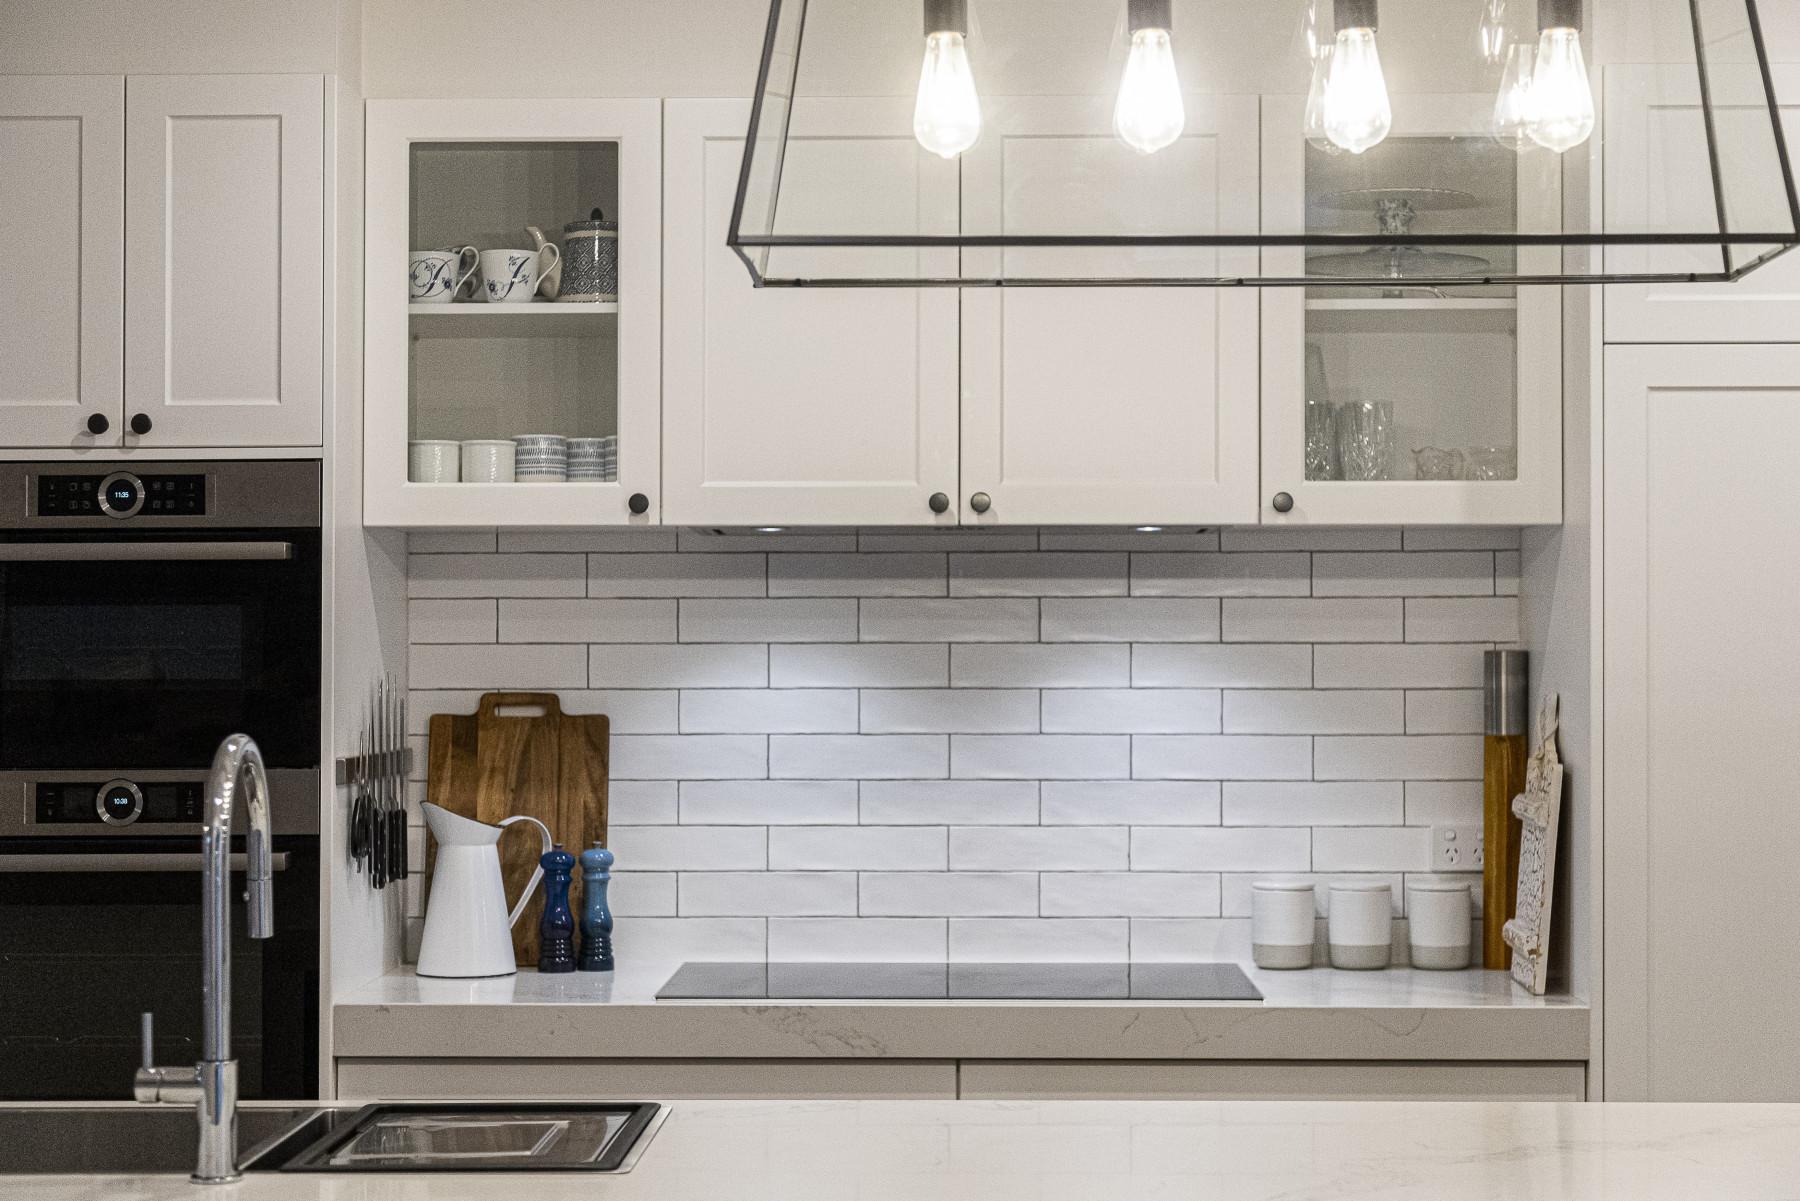 kitchen lighting ideas - Tim Kyle